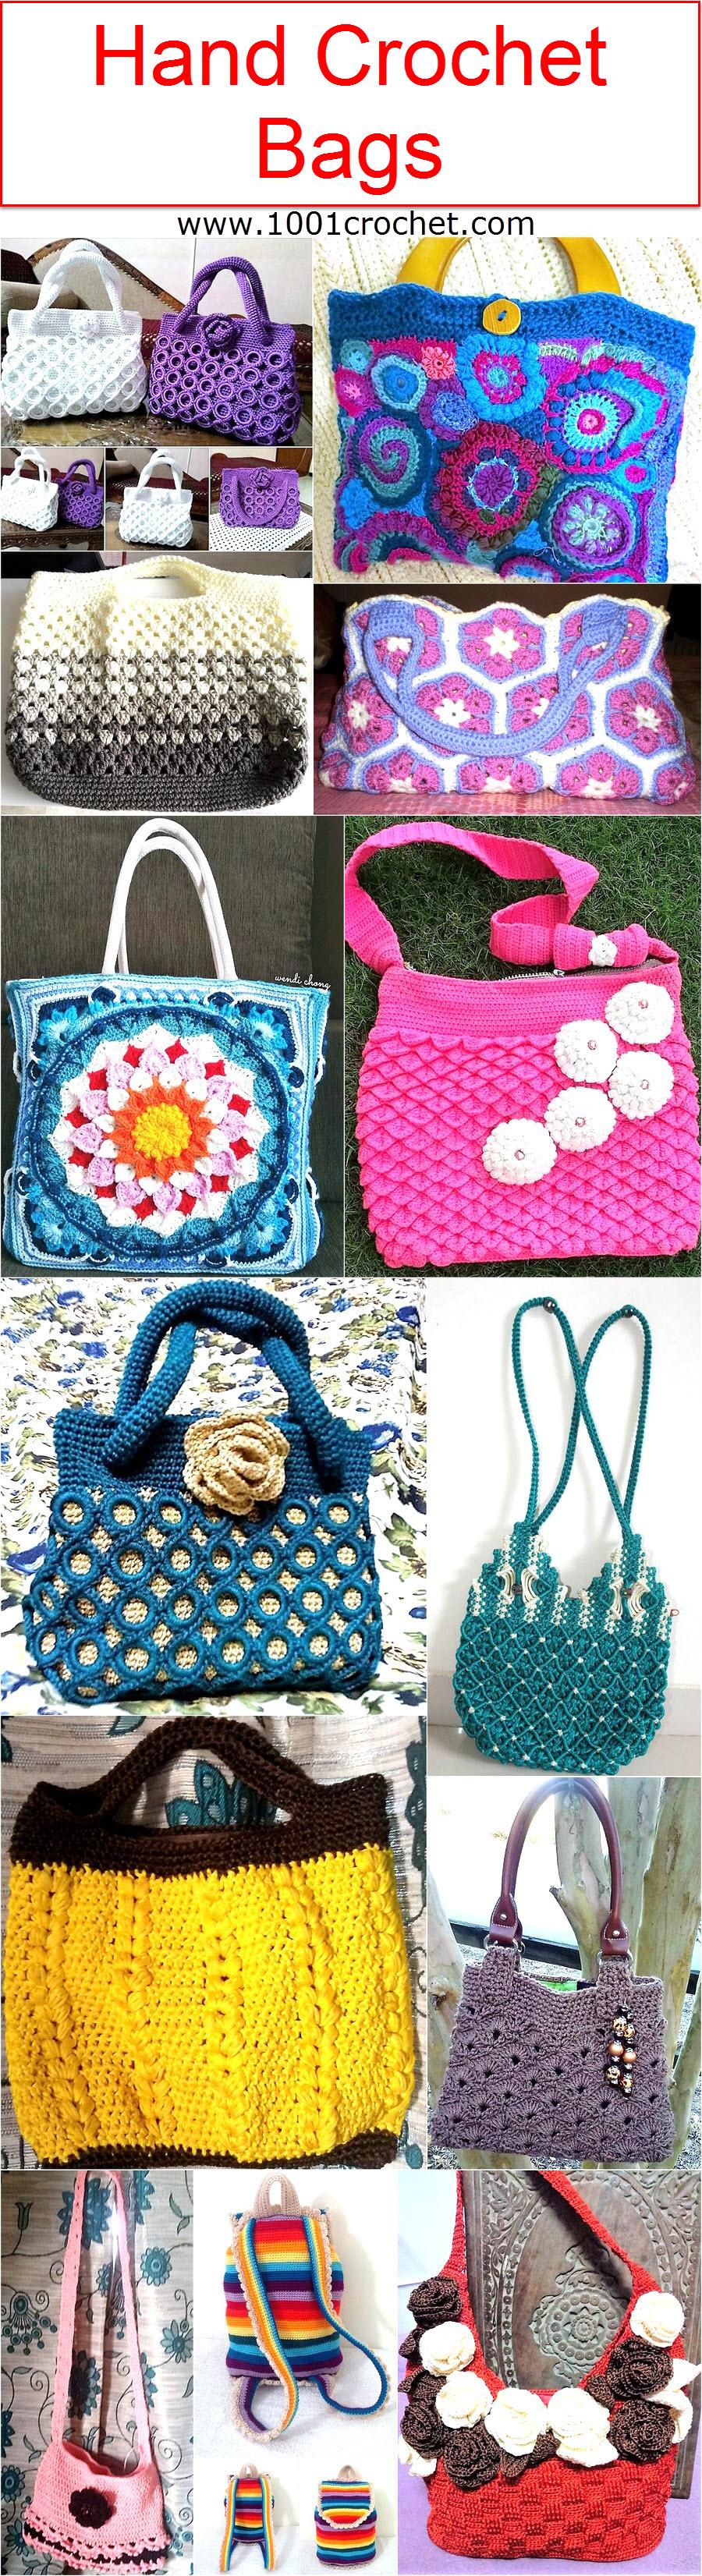 hand-crochet-bags